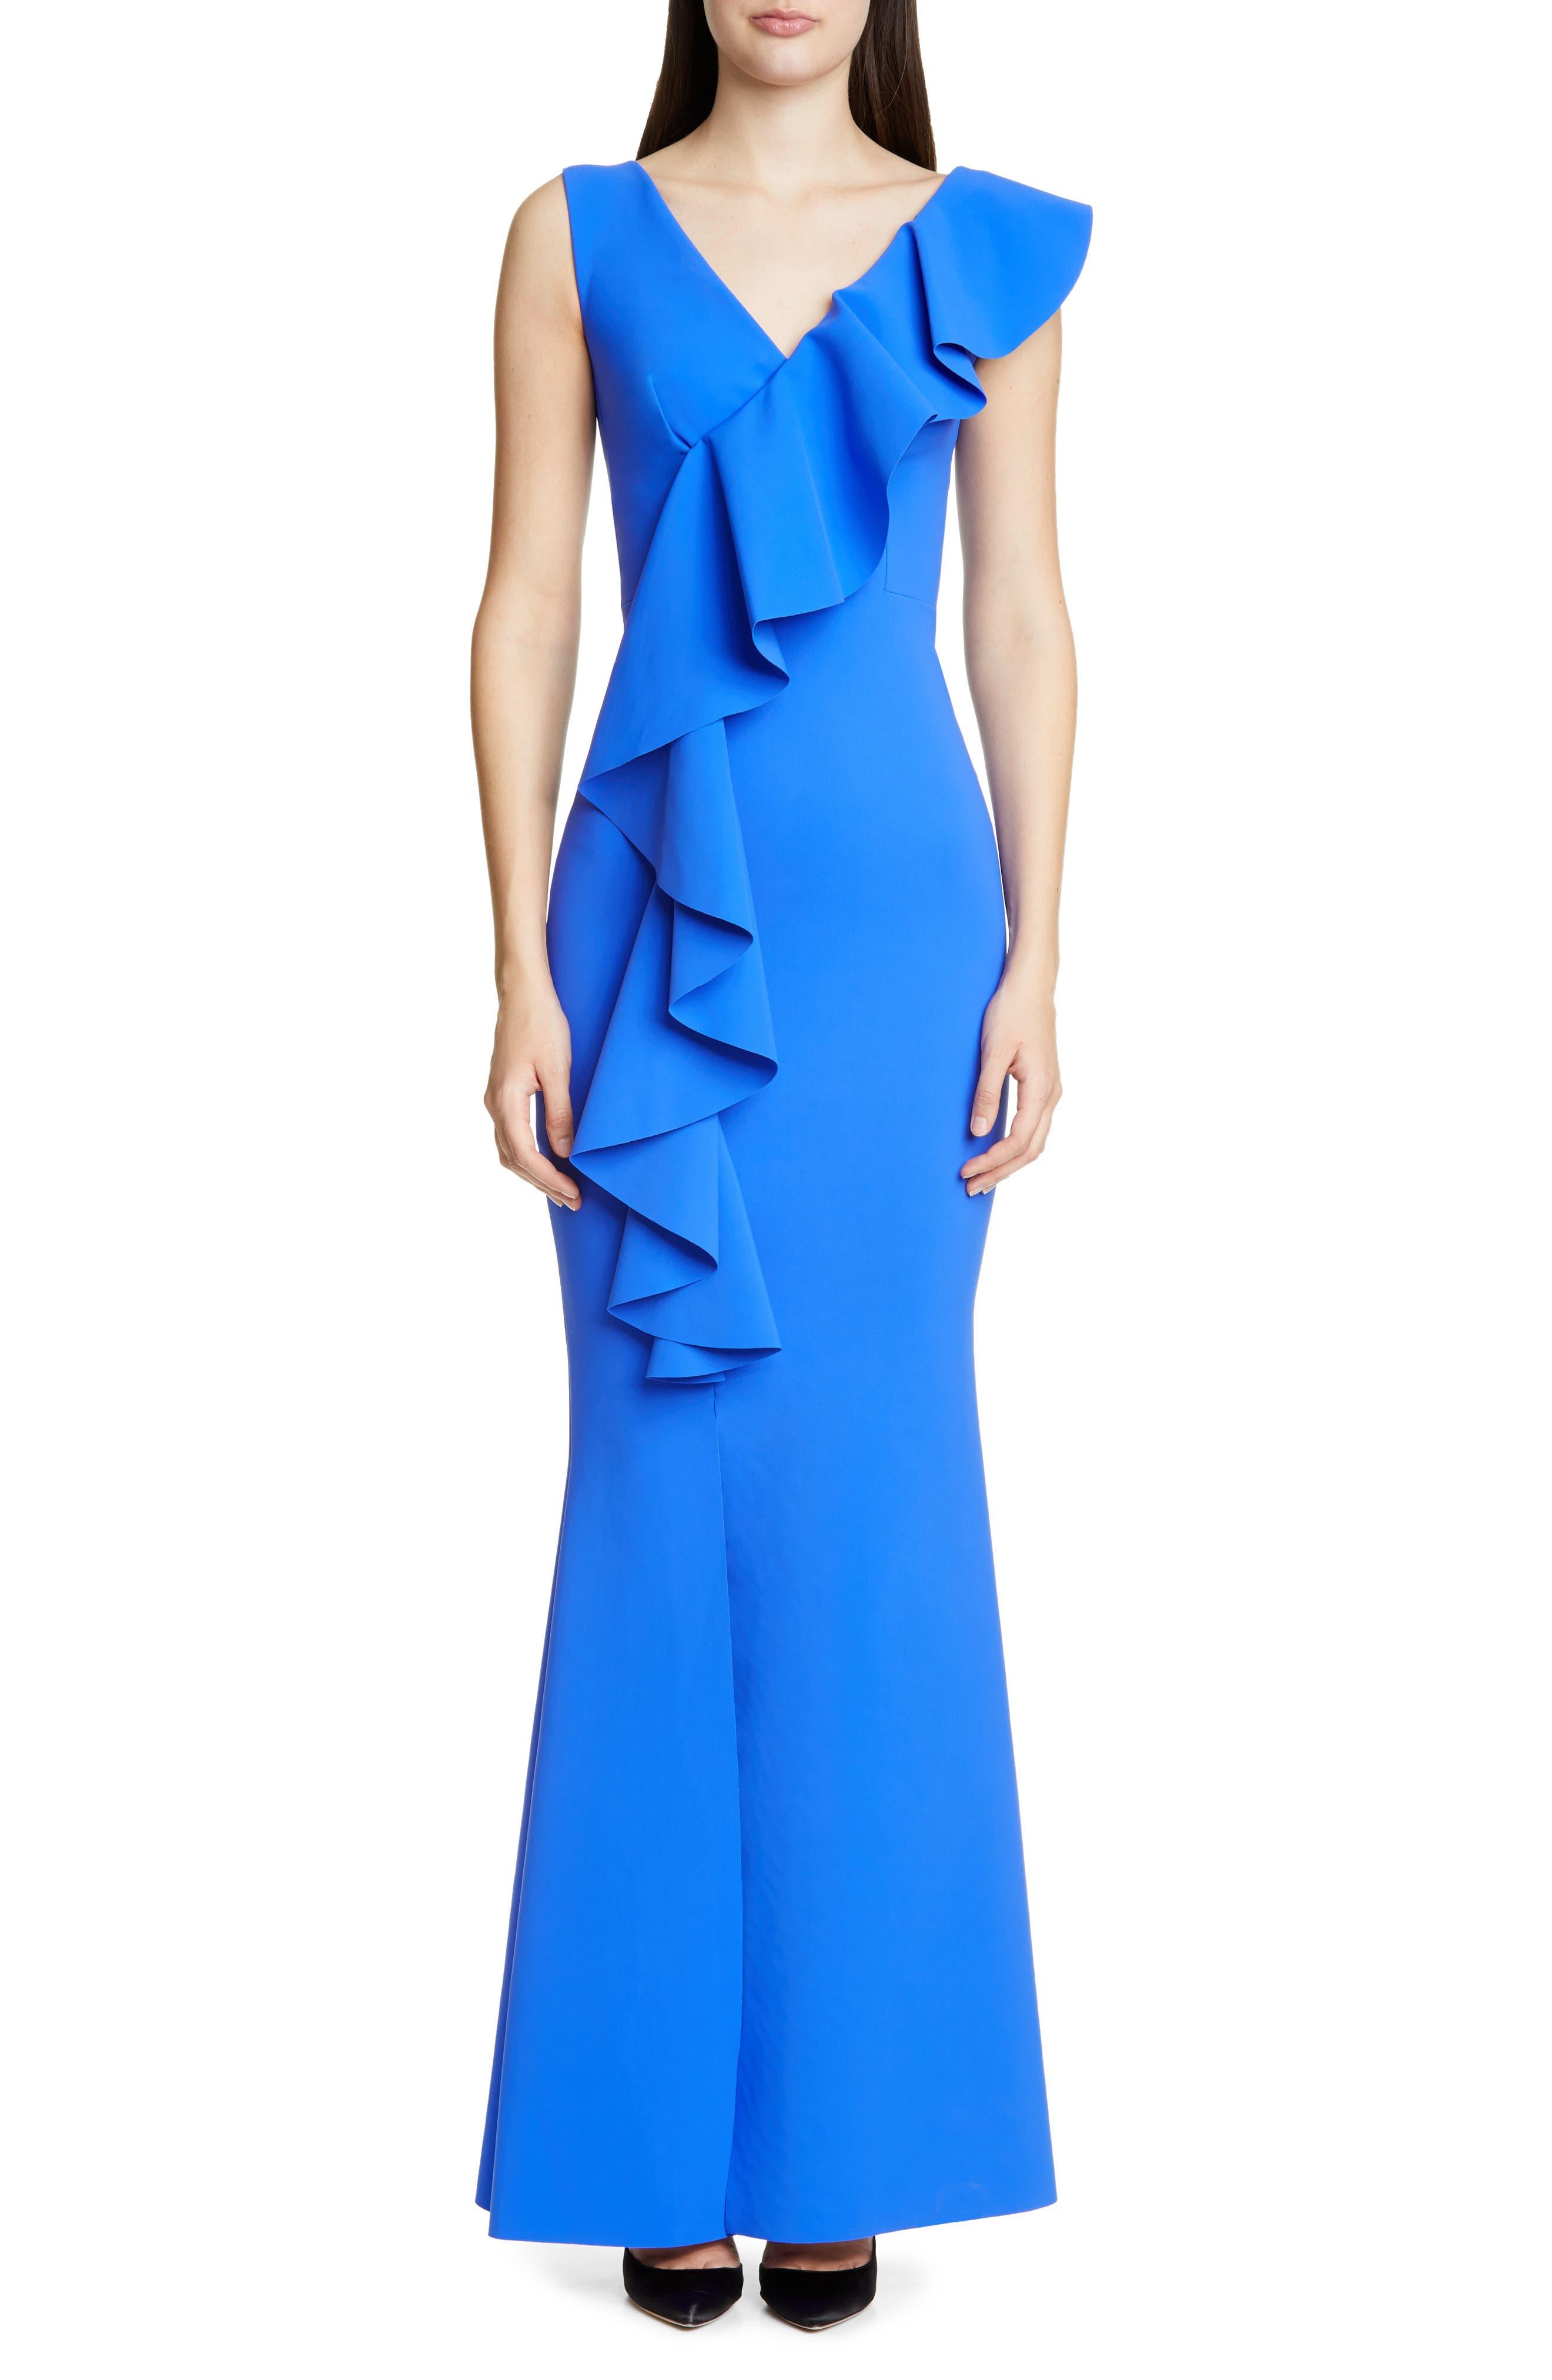 Chiara Boni La Petite Robe Janka Ruffle Evening Gown, 6 IT - Blue